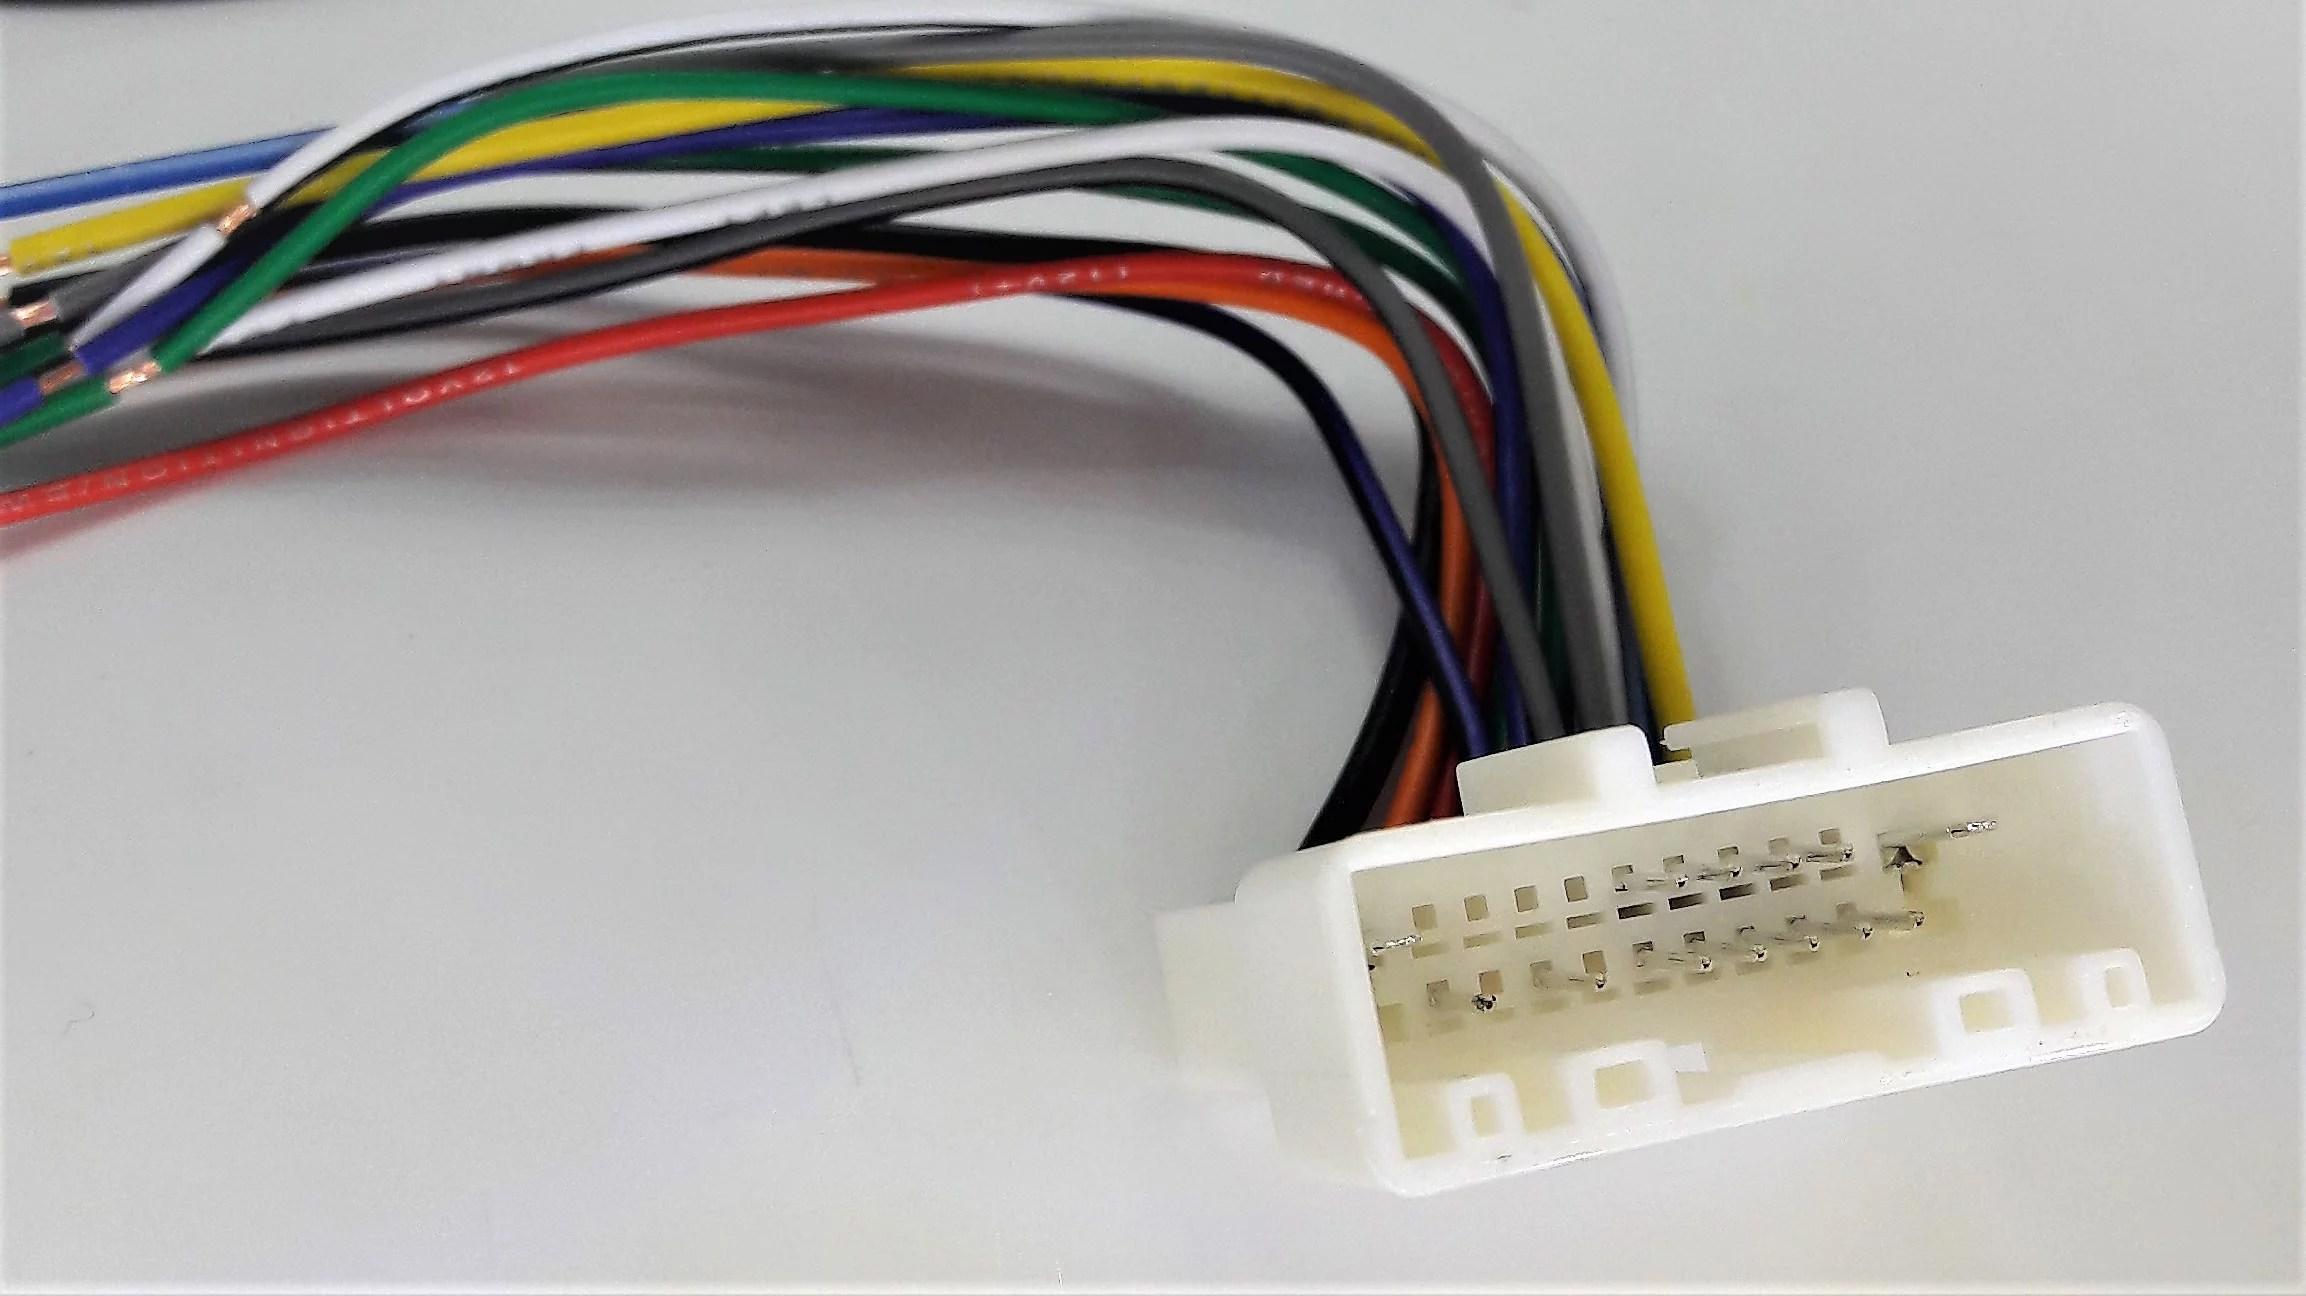 small resolution of carxtc radio wire harness installs new car stereo fits nissan titancarxtc radio wire harness installs new